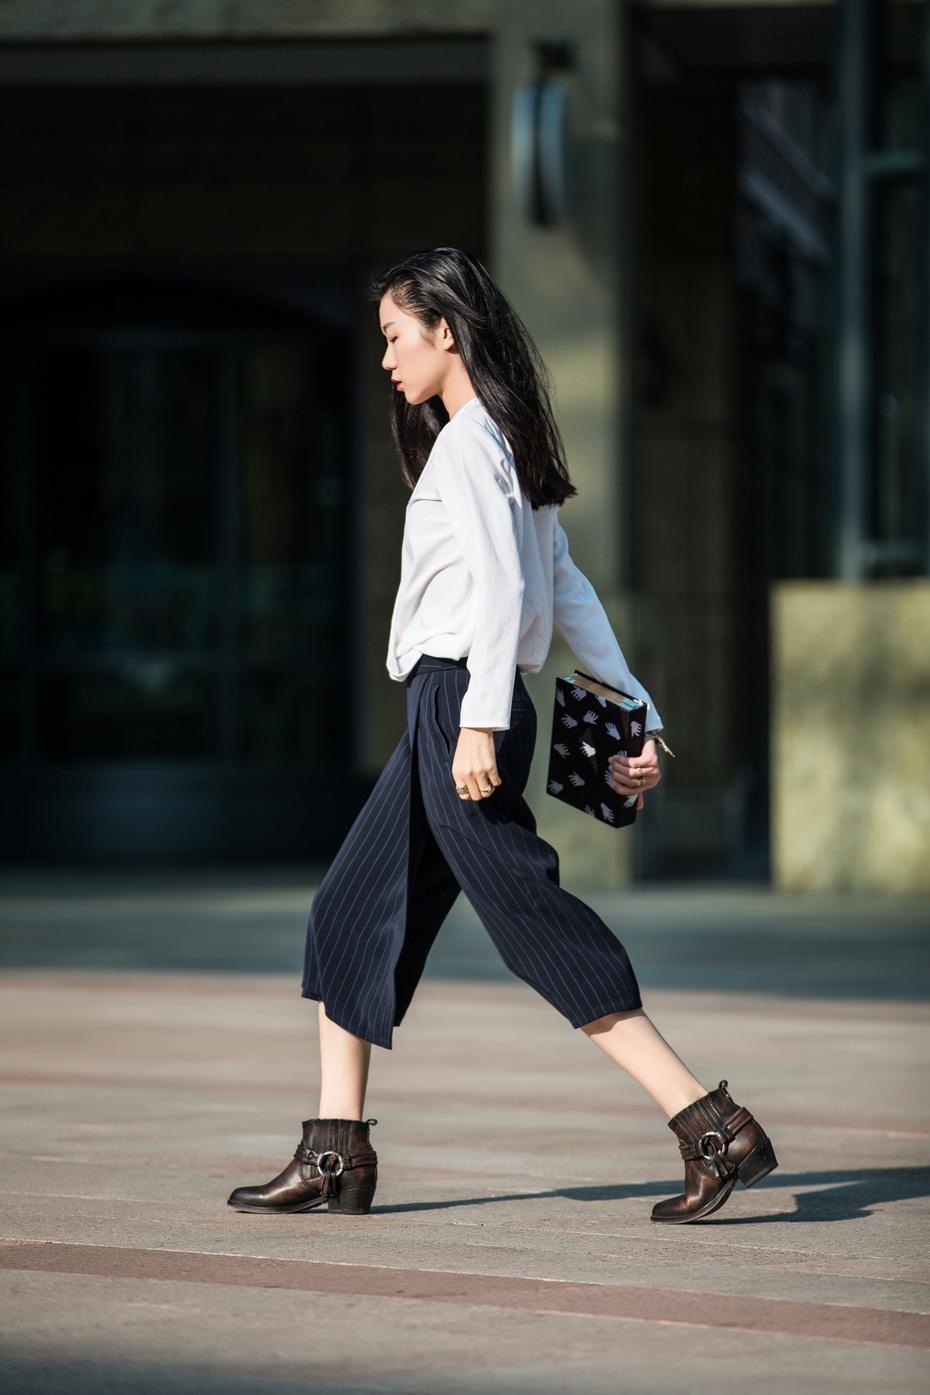 [Ava搭配周记]一衣多穿之设计感裙裤 - AvaFoo - Avas Fashion Blog